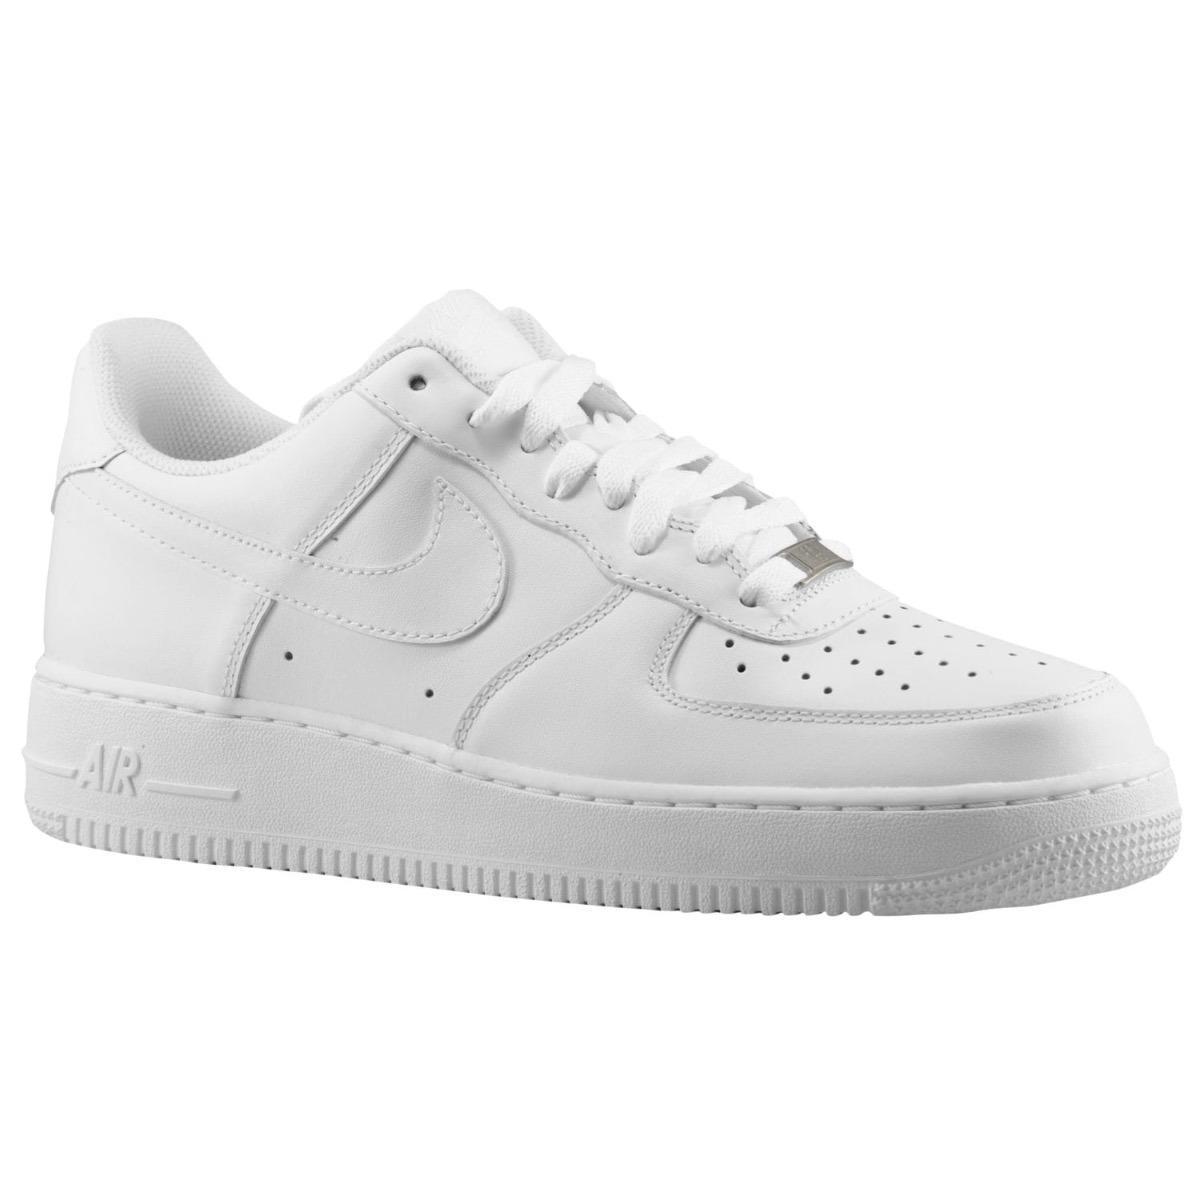 Tenis Zapatillas Nike Air Force 1 Blancas Hombre Envió Grati